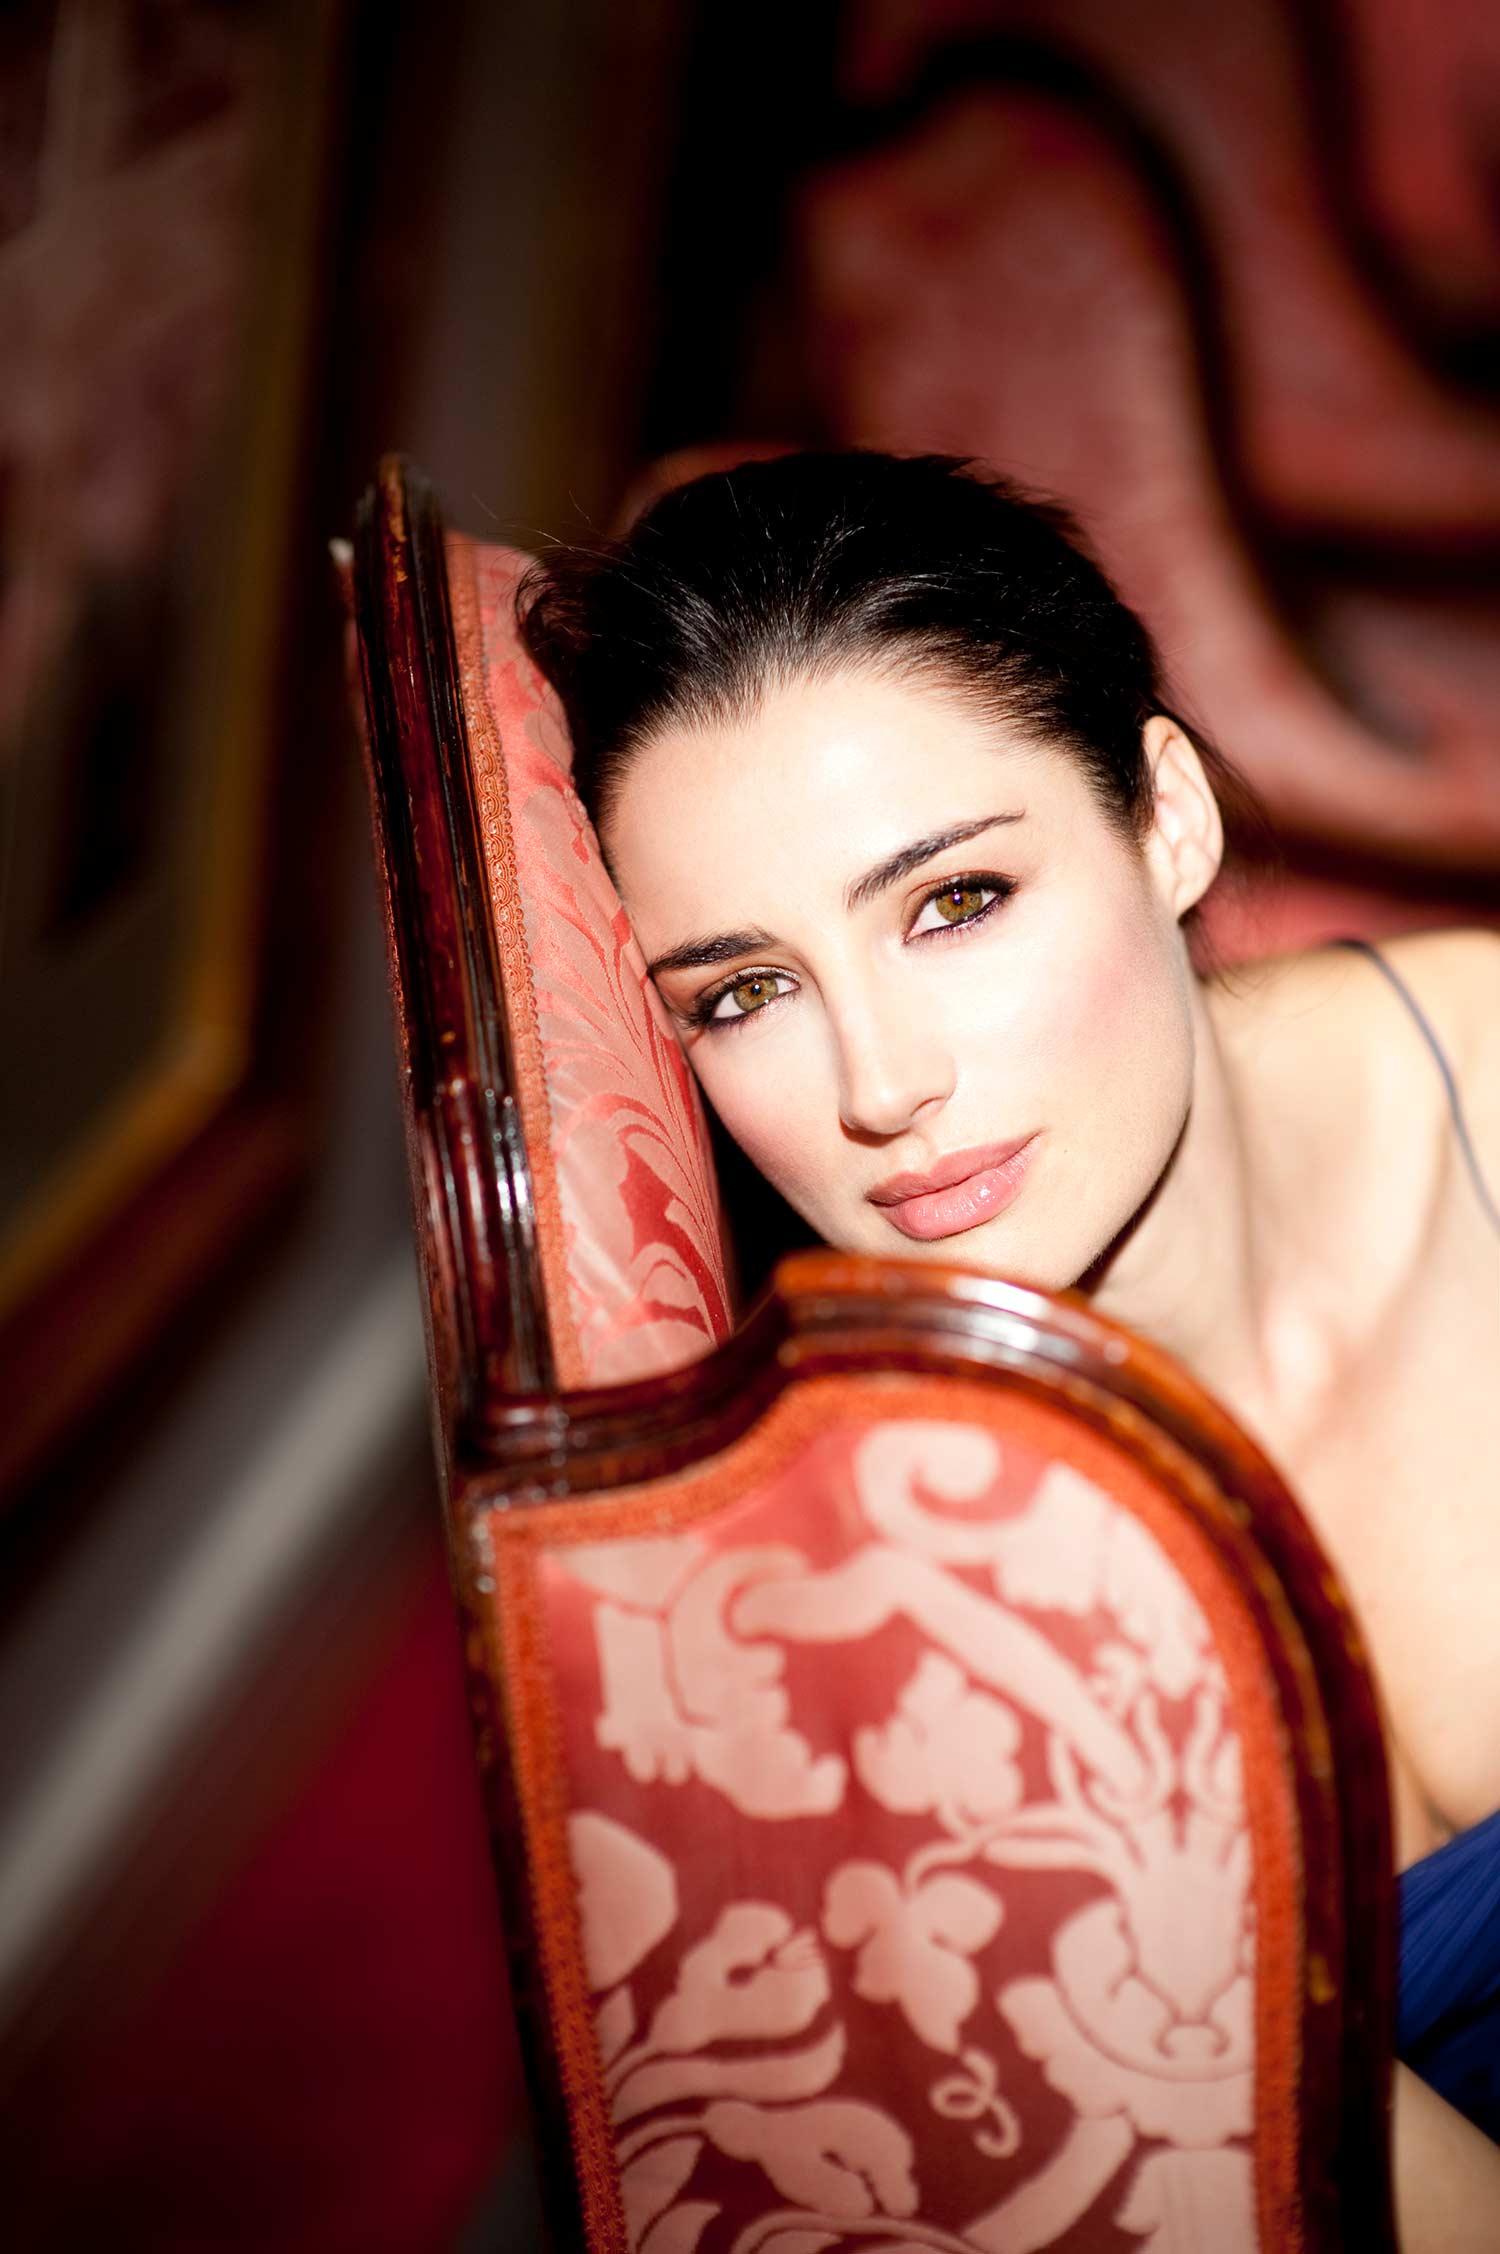 Luisa Ranieri - Photo by Gianmarco Chieregato - Hotel Majestic Rome